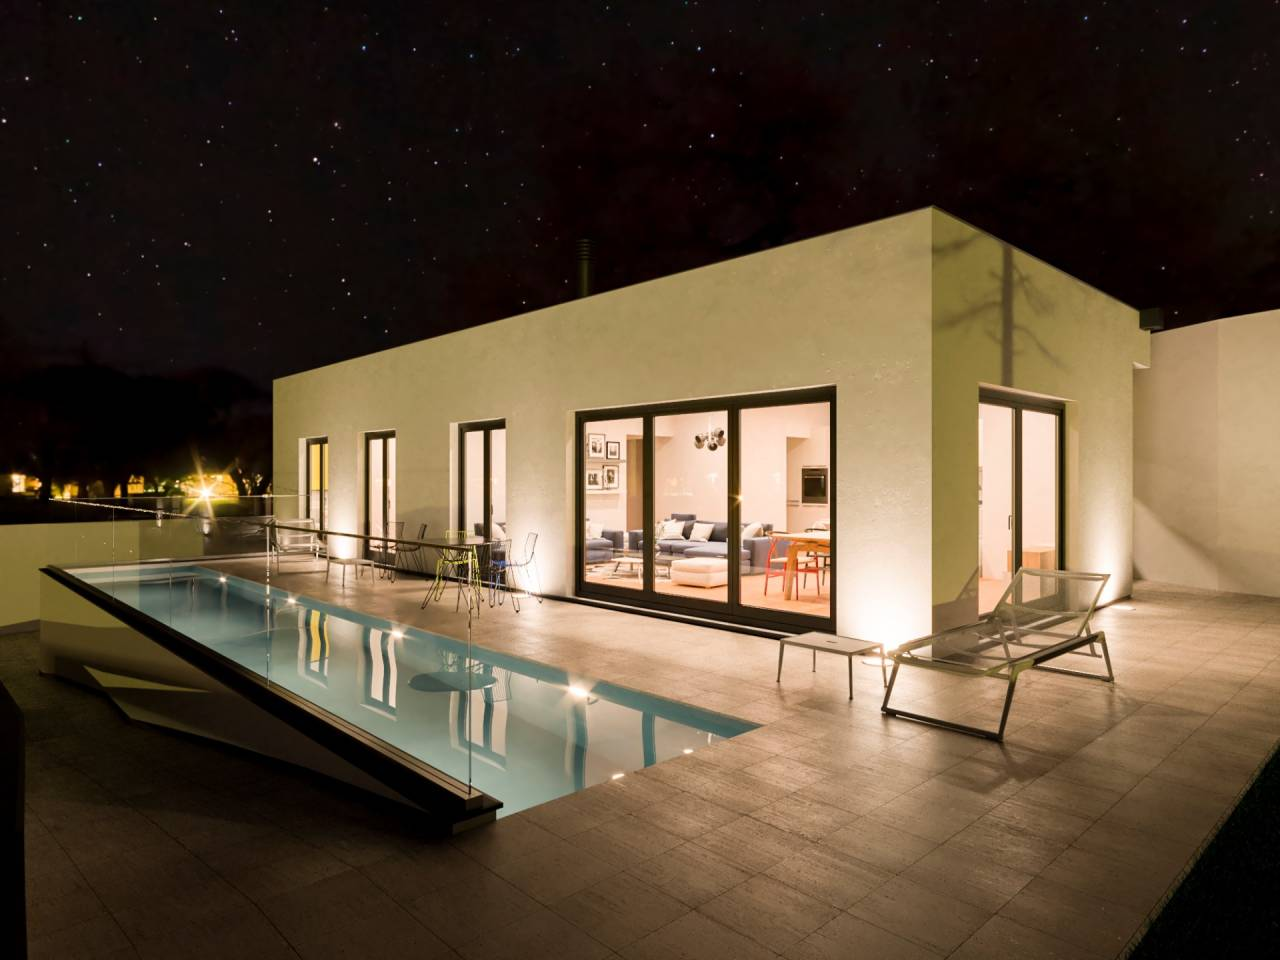 Casa 4 vientos próxima a construir con piscina